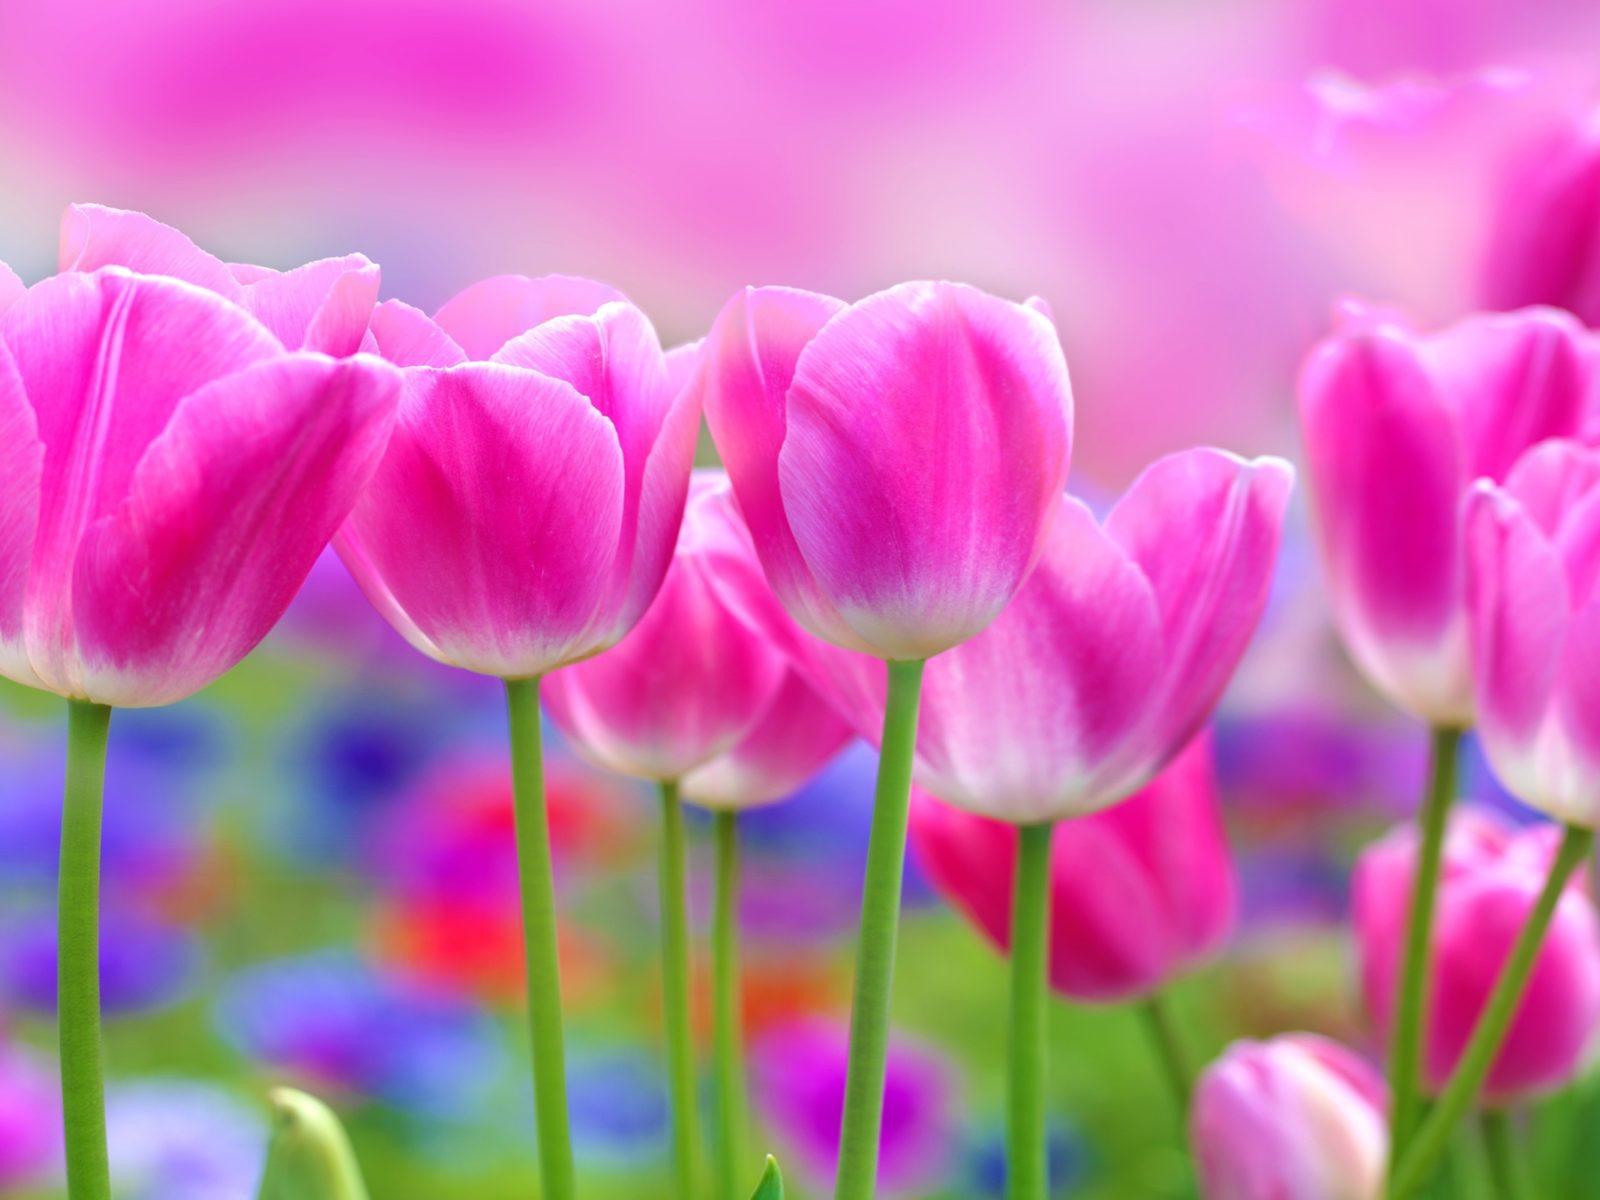 Desert Landscape Wallpaper Hd Beautiful Pink Tulips Flowers Blur Background 2560x1600